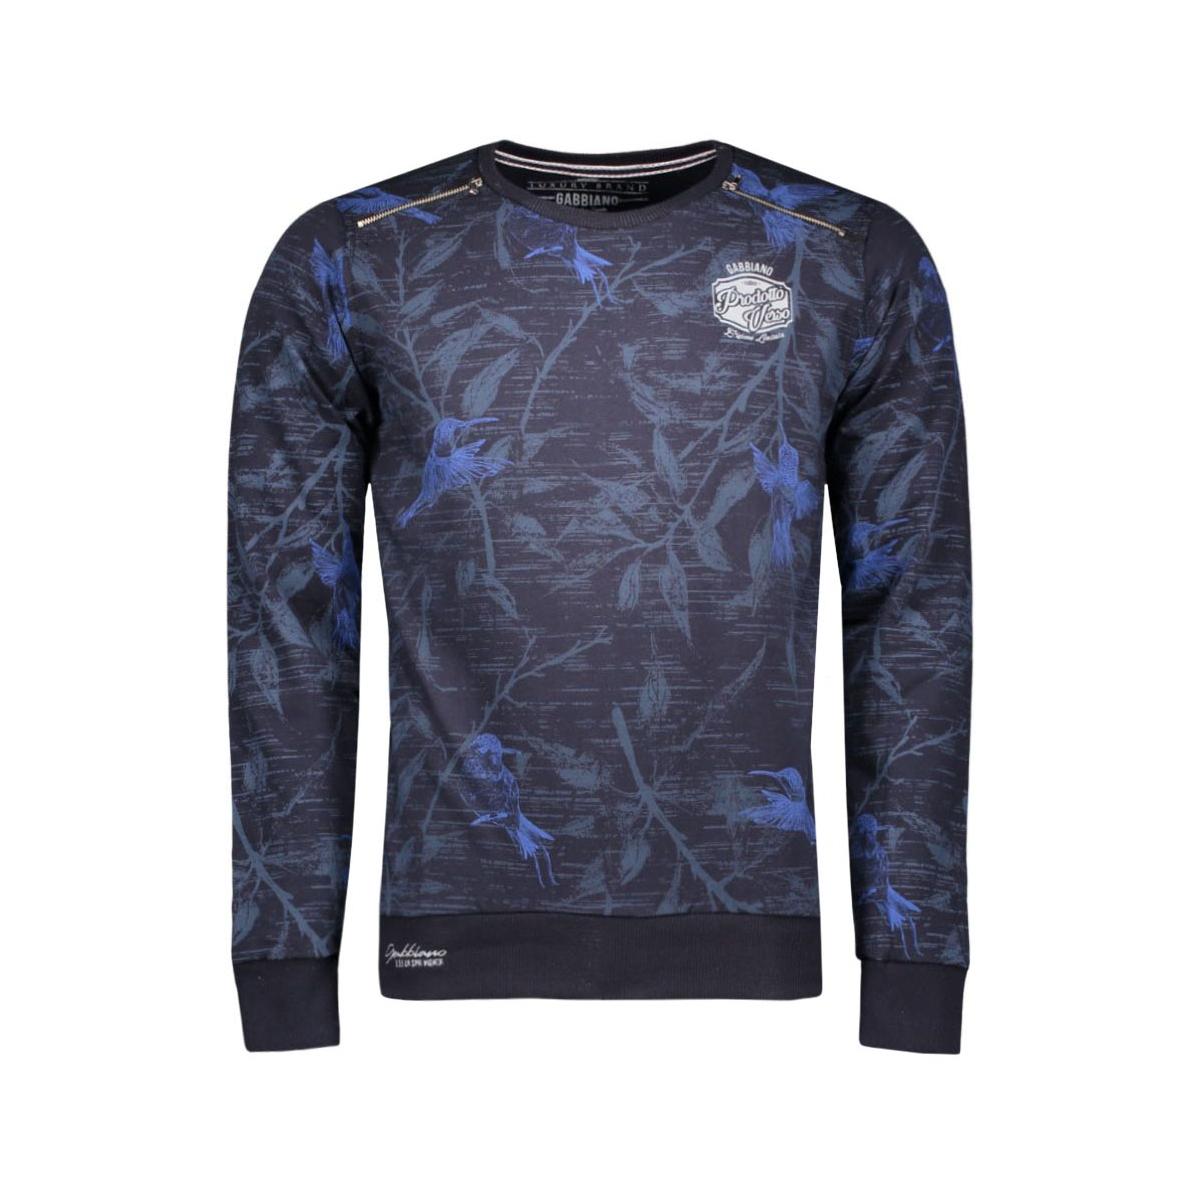 5378 gabbiano sweater navy